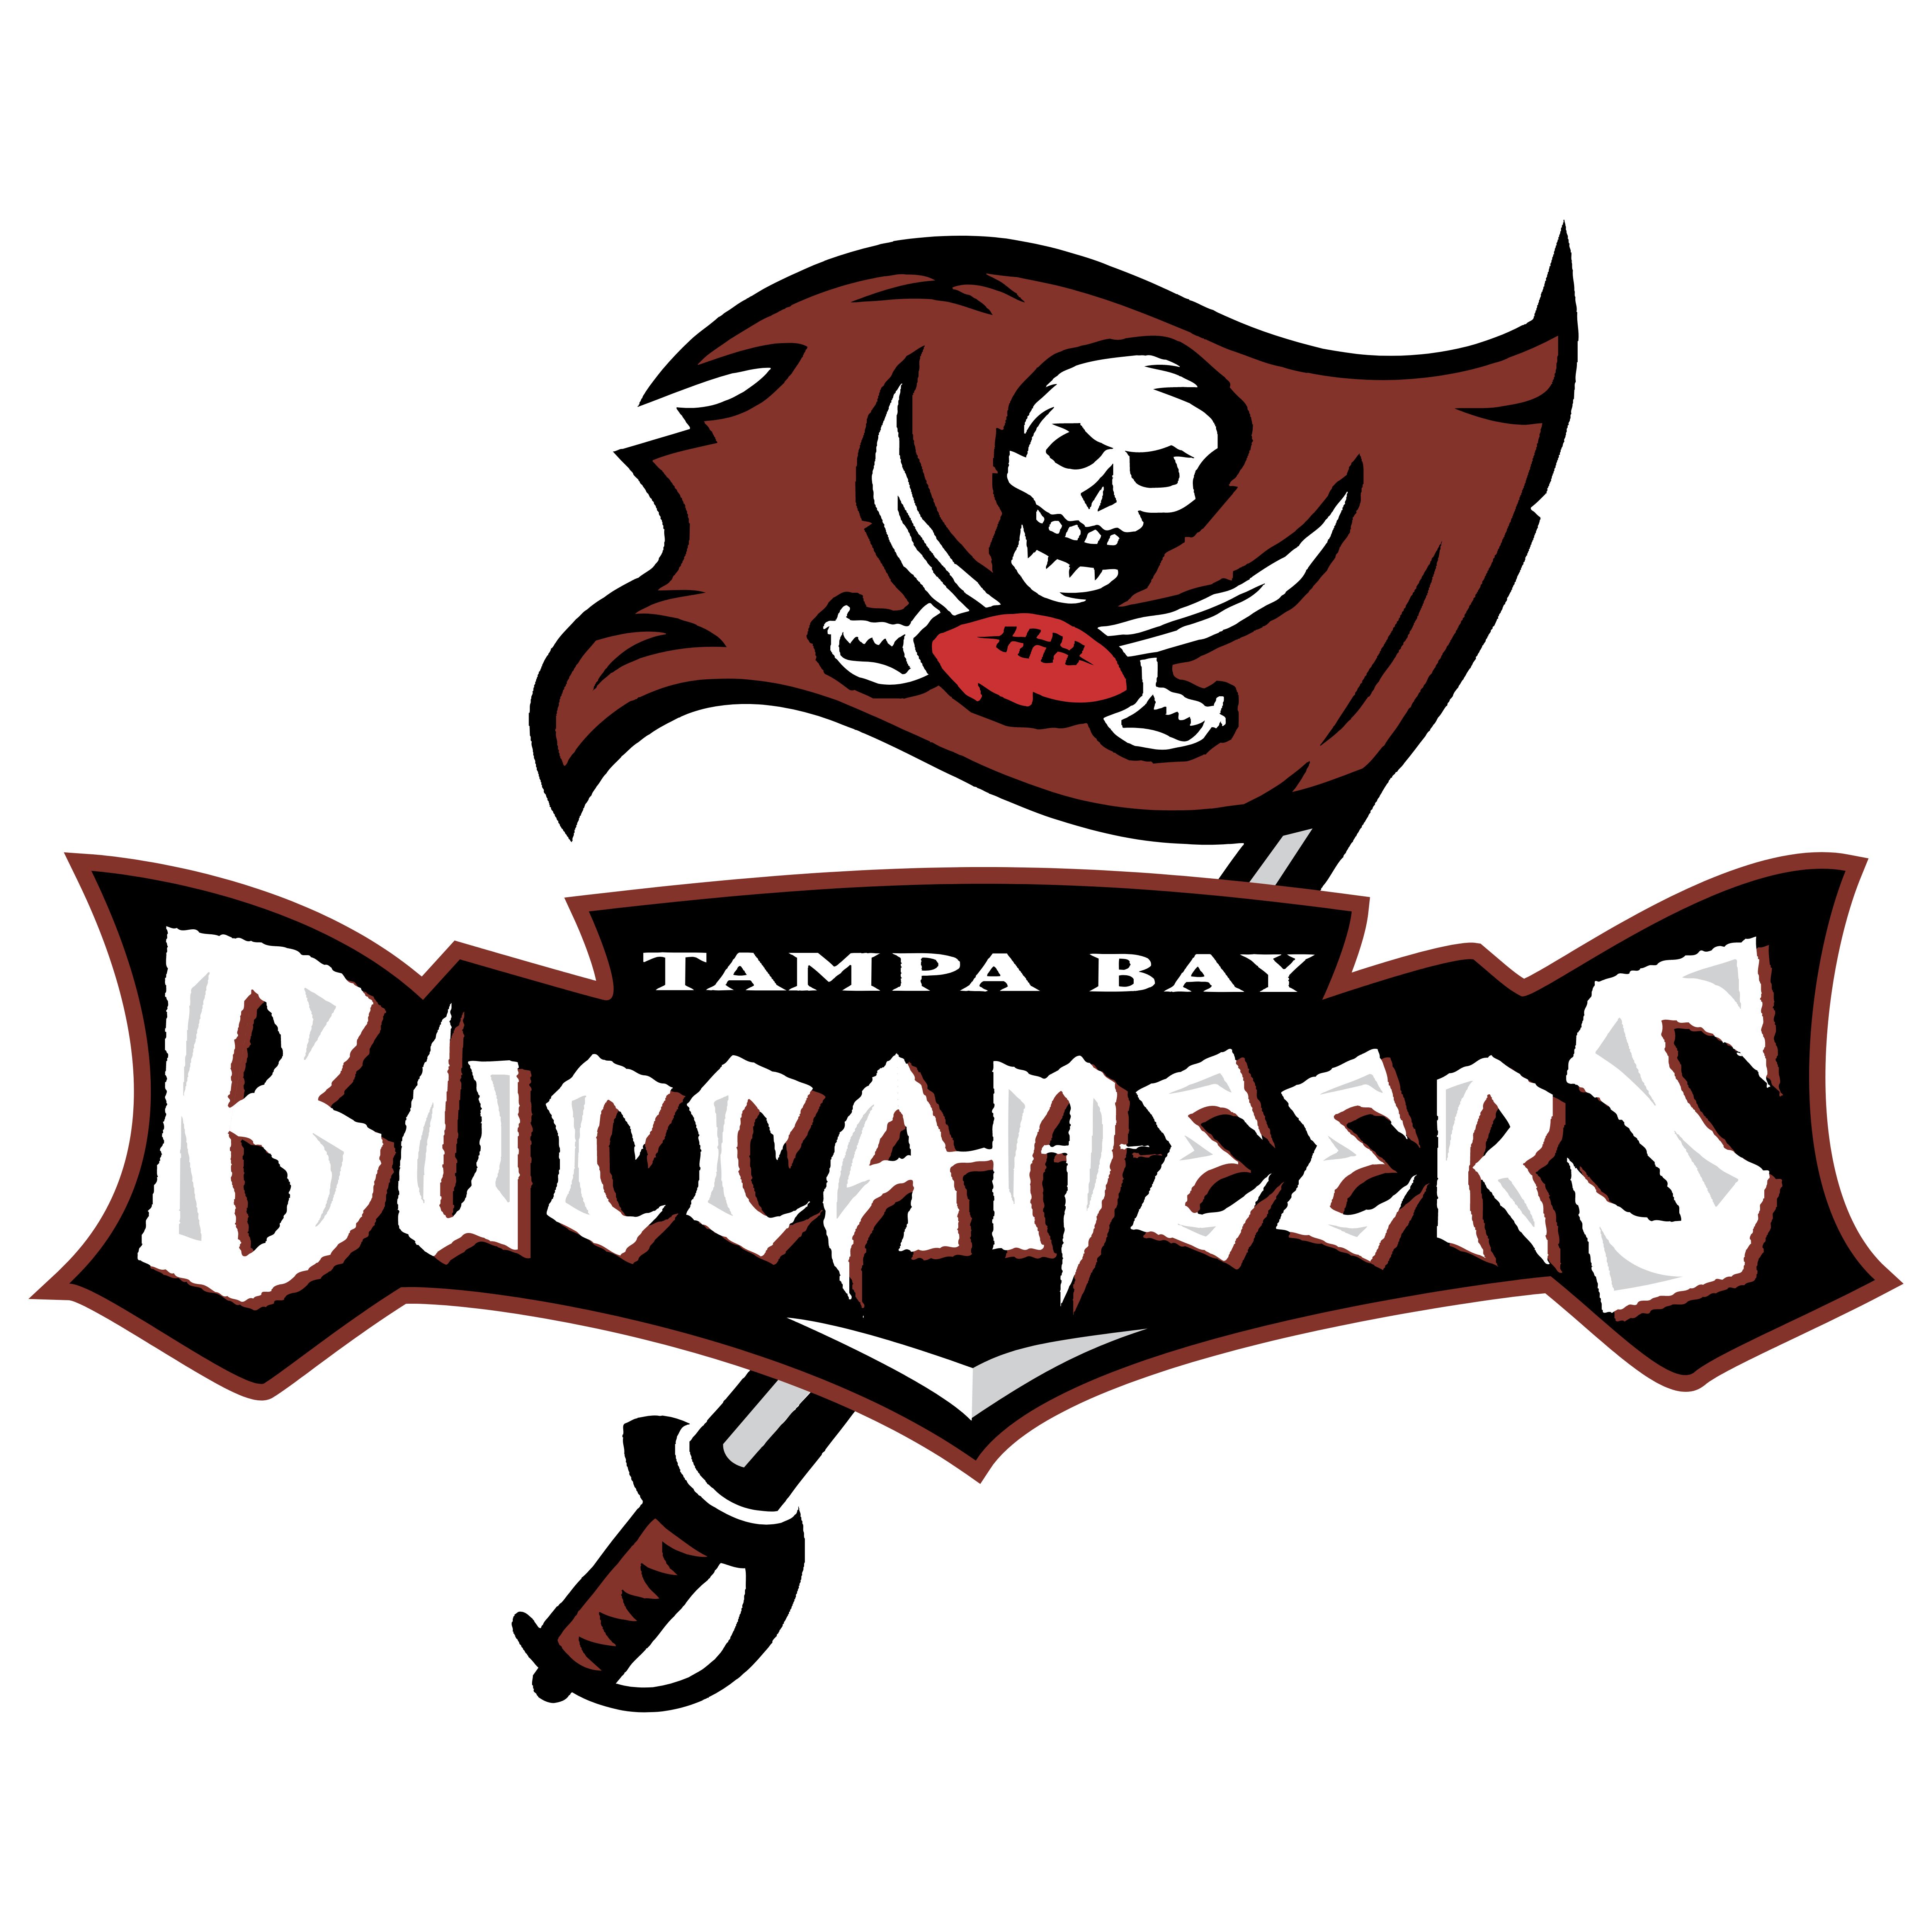 Tampa Bay Buccaneers Logos Download